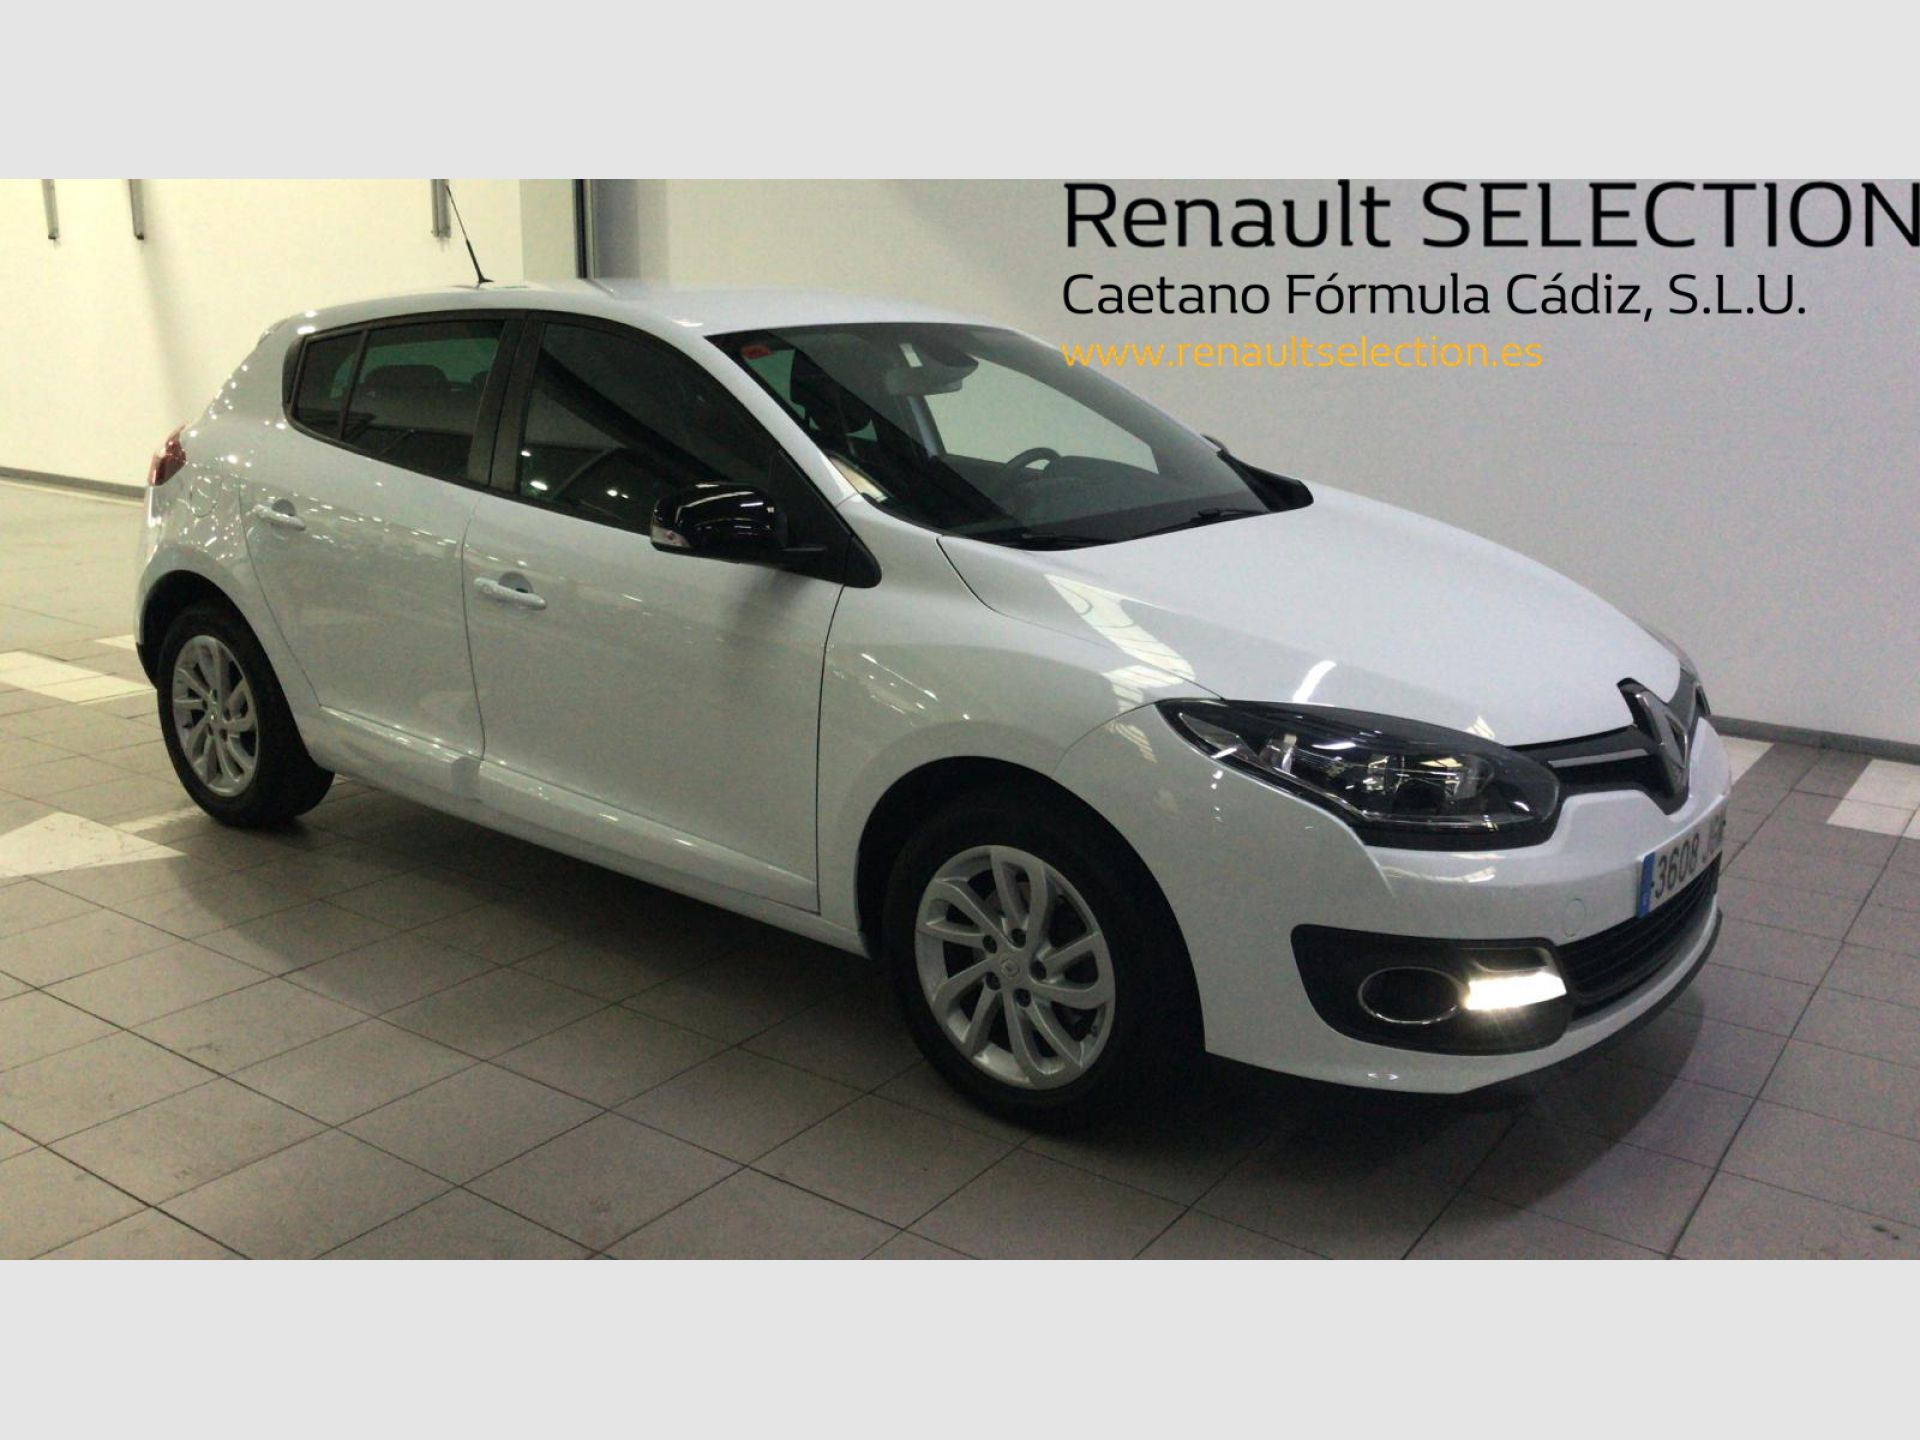 Renault Megane Limited Energy TCe 115 S&S eco2 segunda mano Cádiz